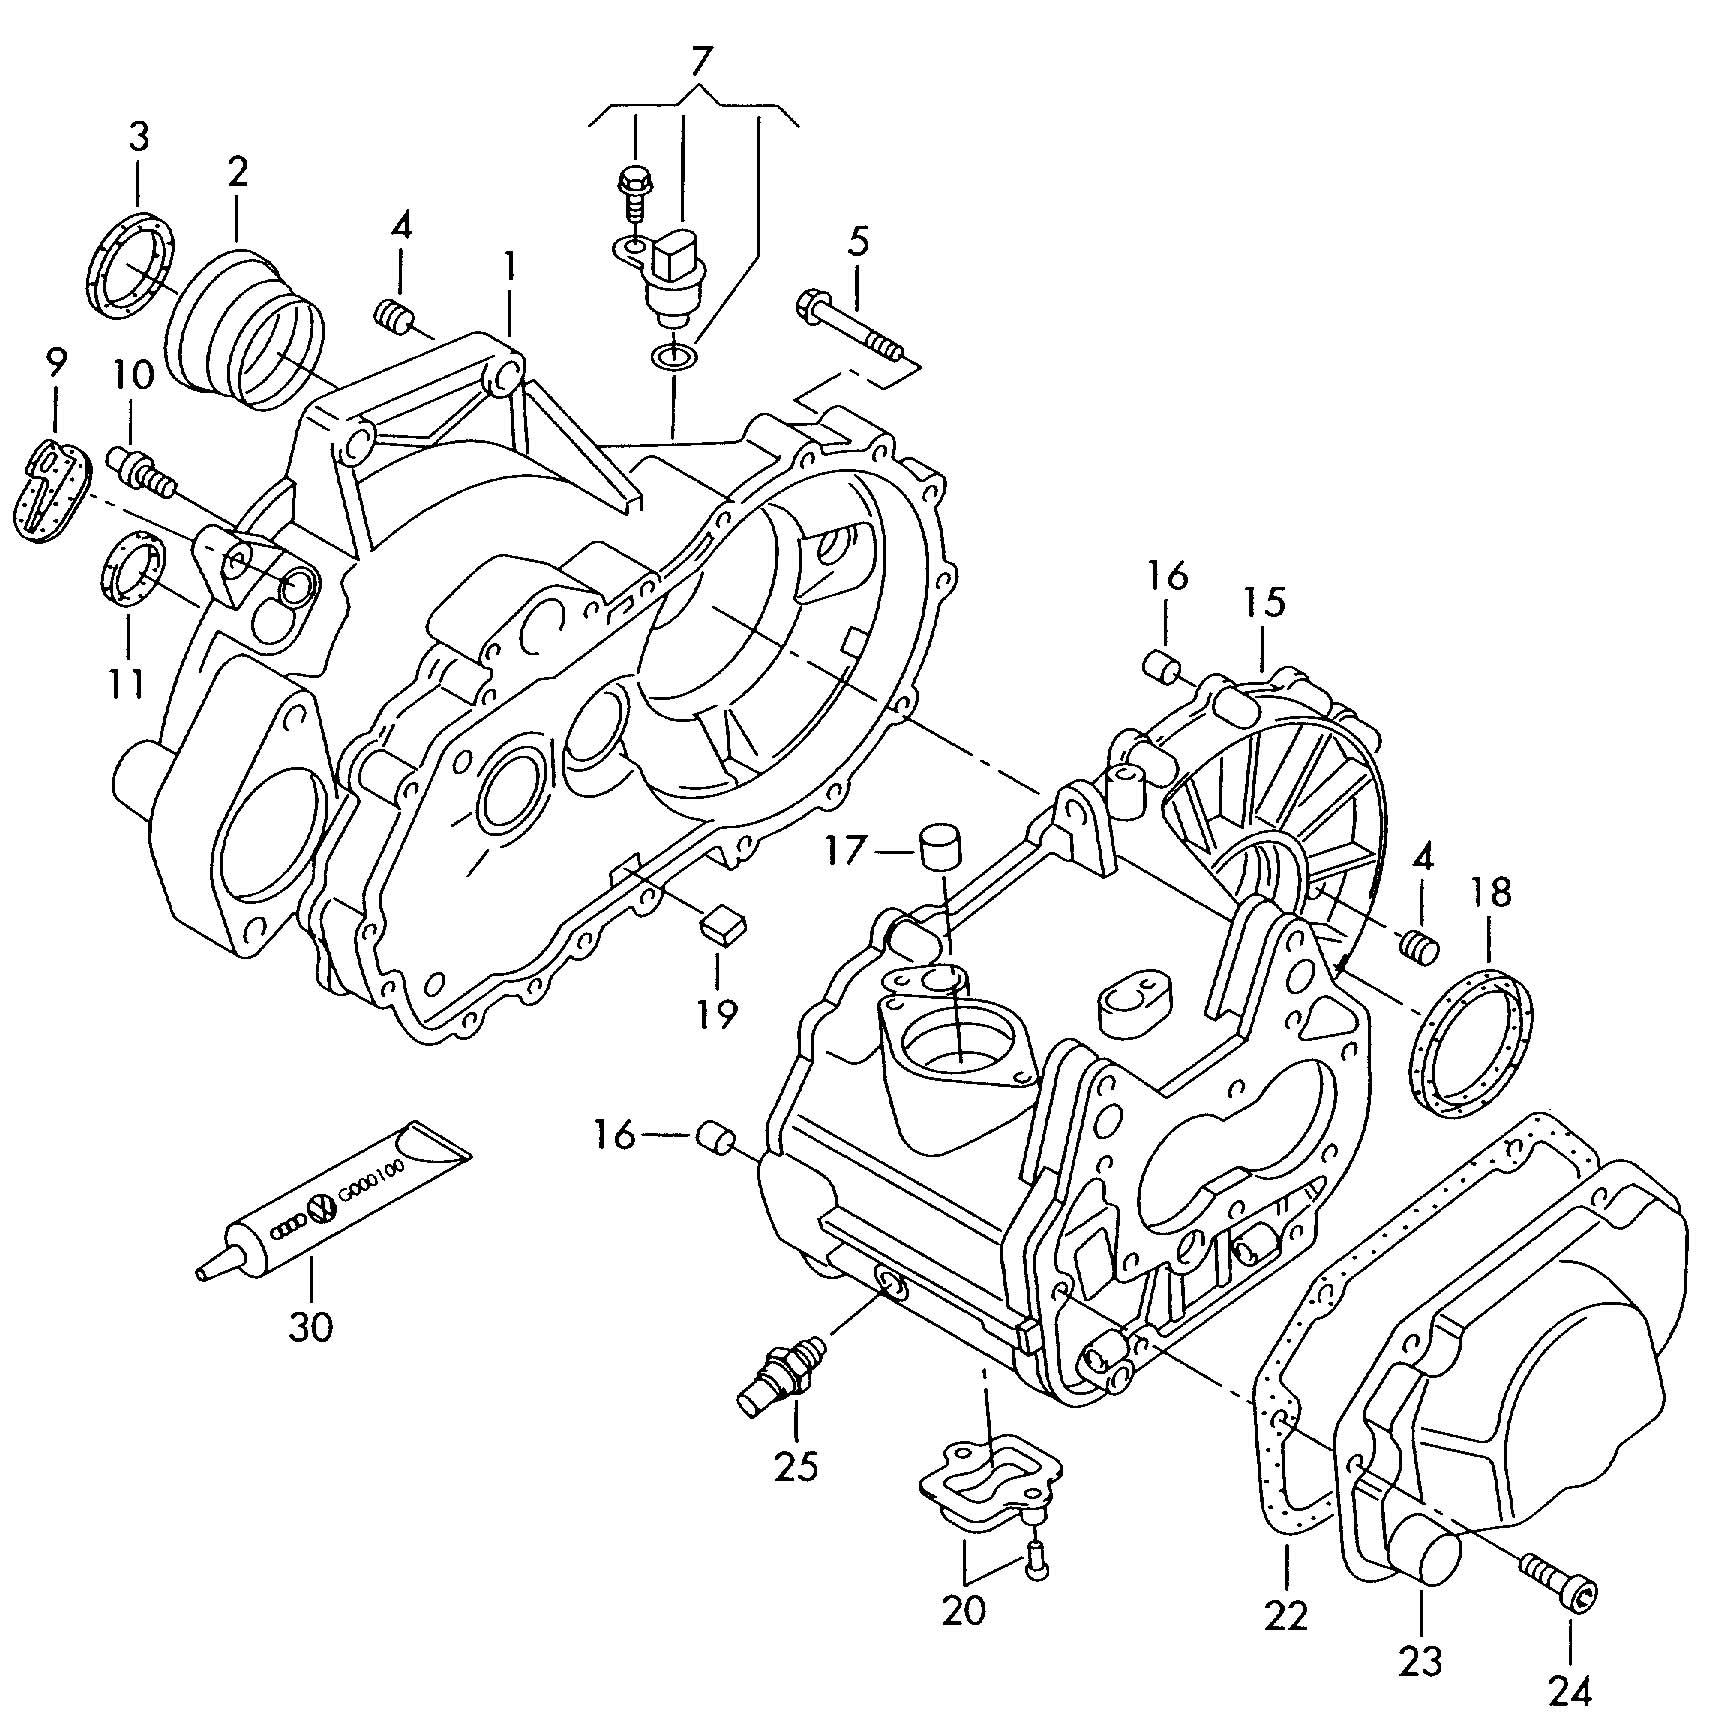 Transmission case for 5 speed manual transmiss.